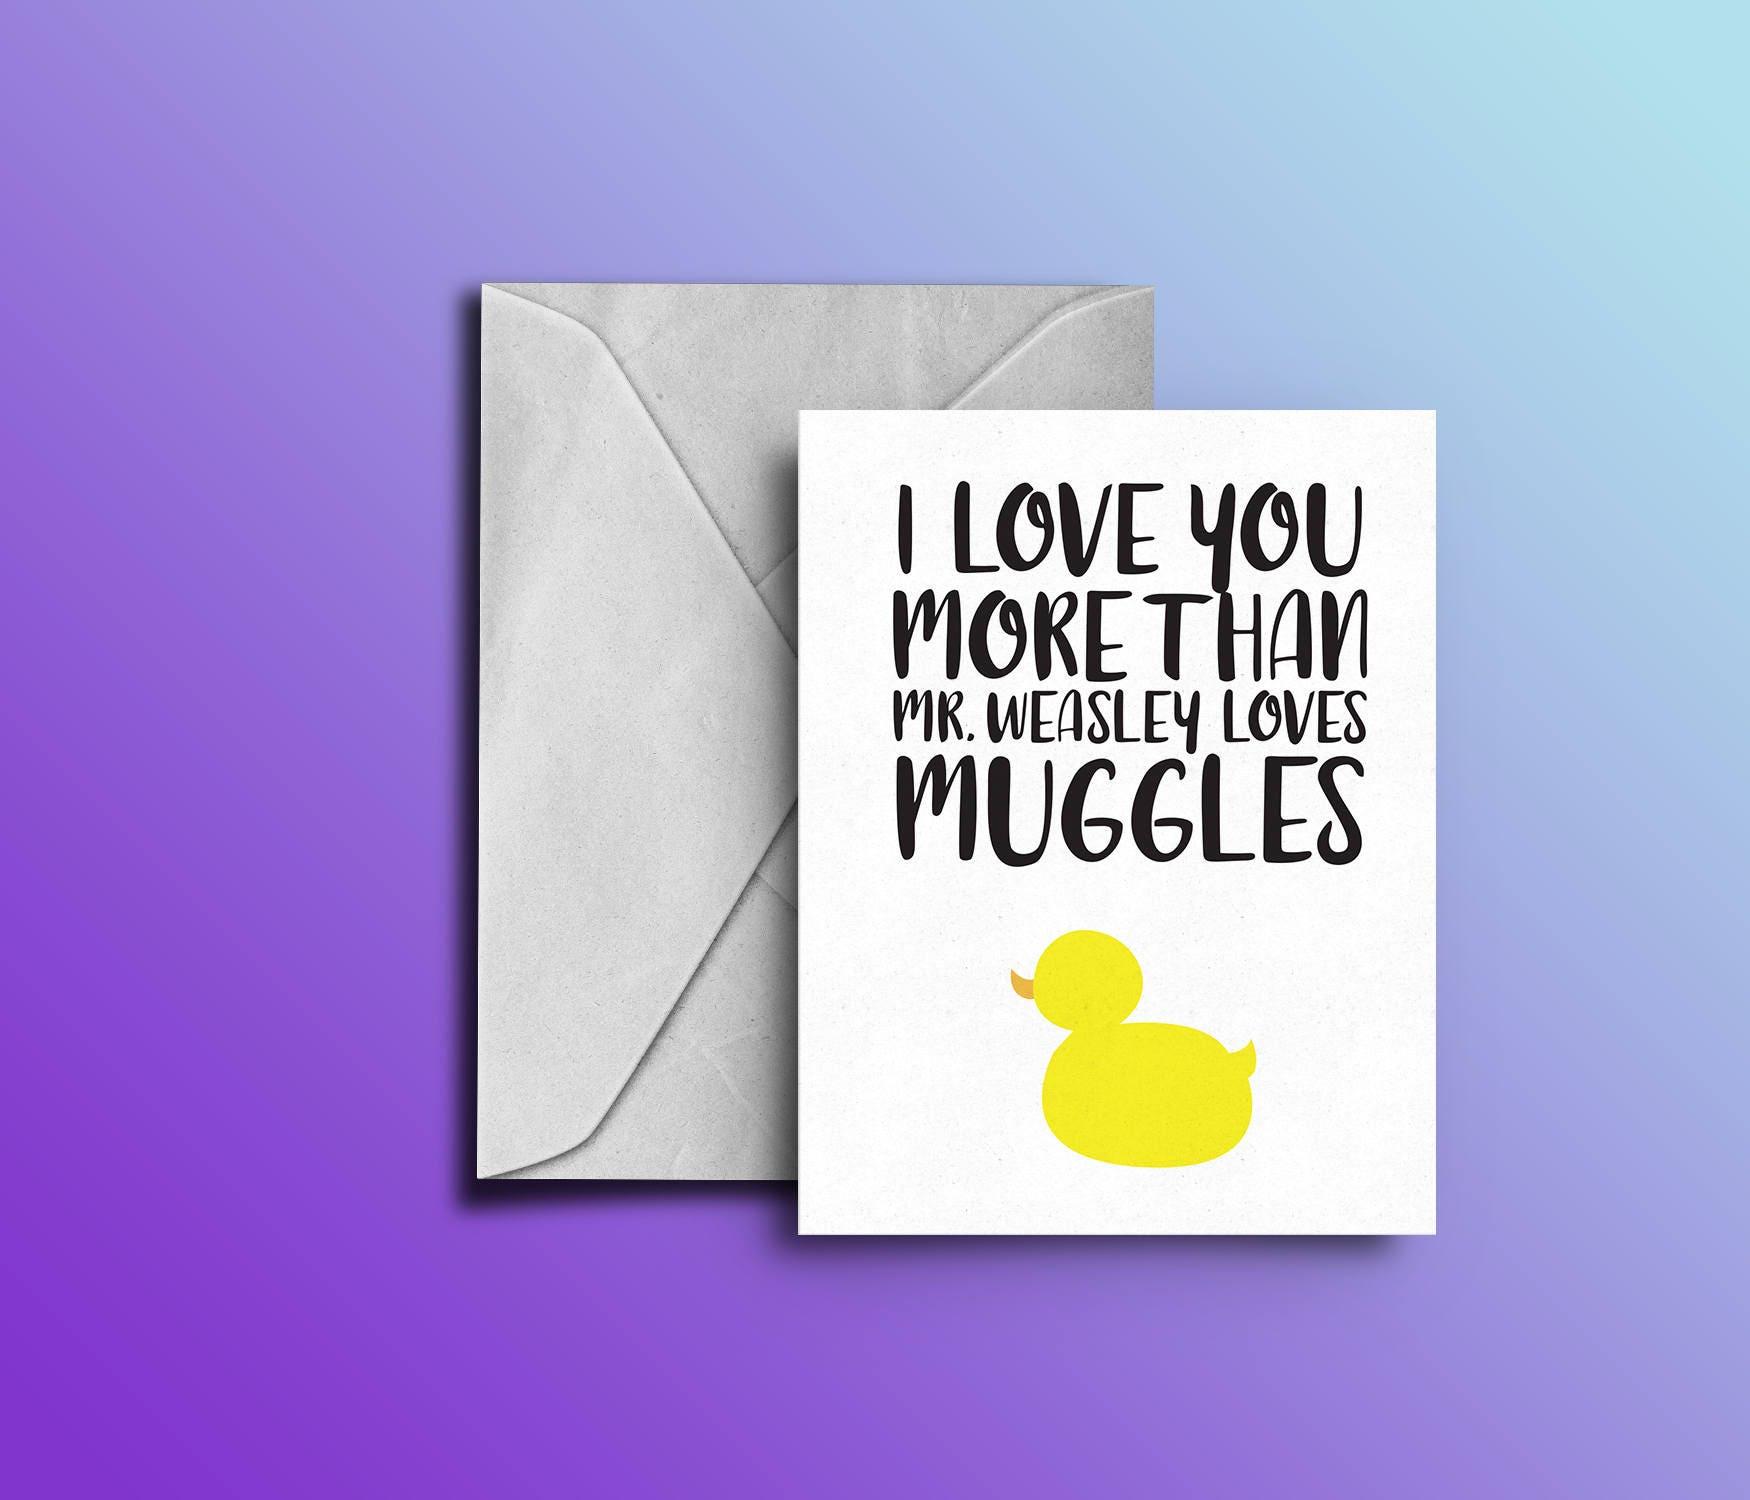 Harry Potter Valentineu0027s Day Card U2015 Nerdy Love Card U2015 Print At Home  Anniversary Card U2015